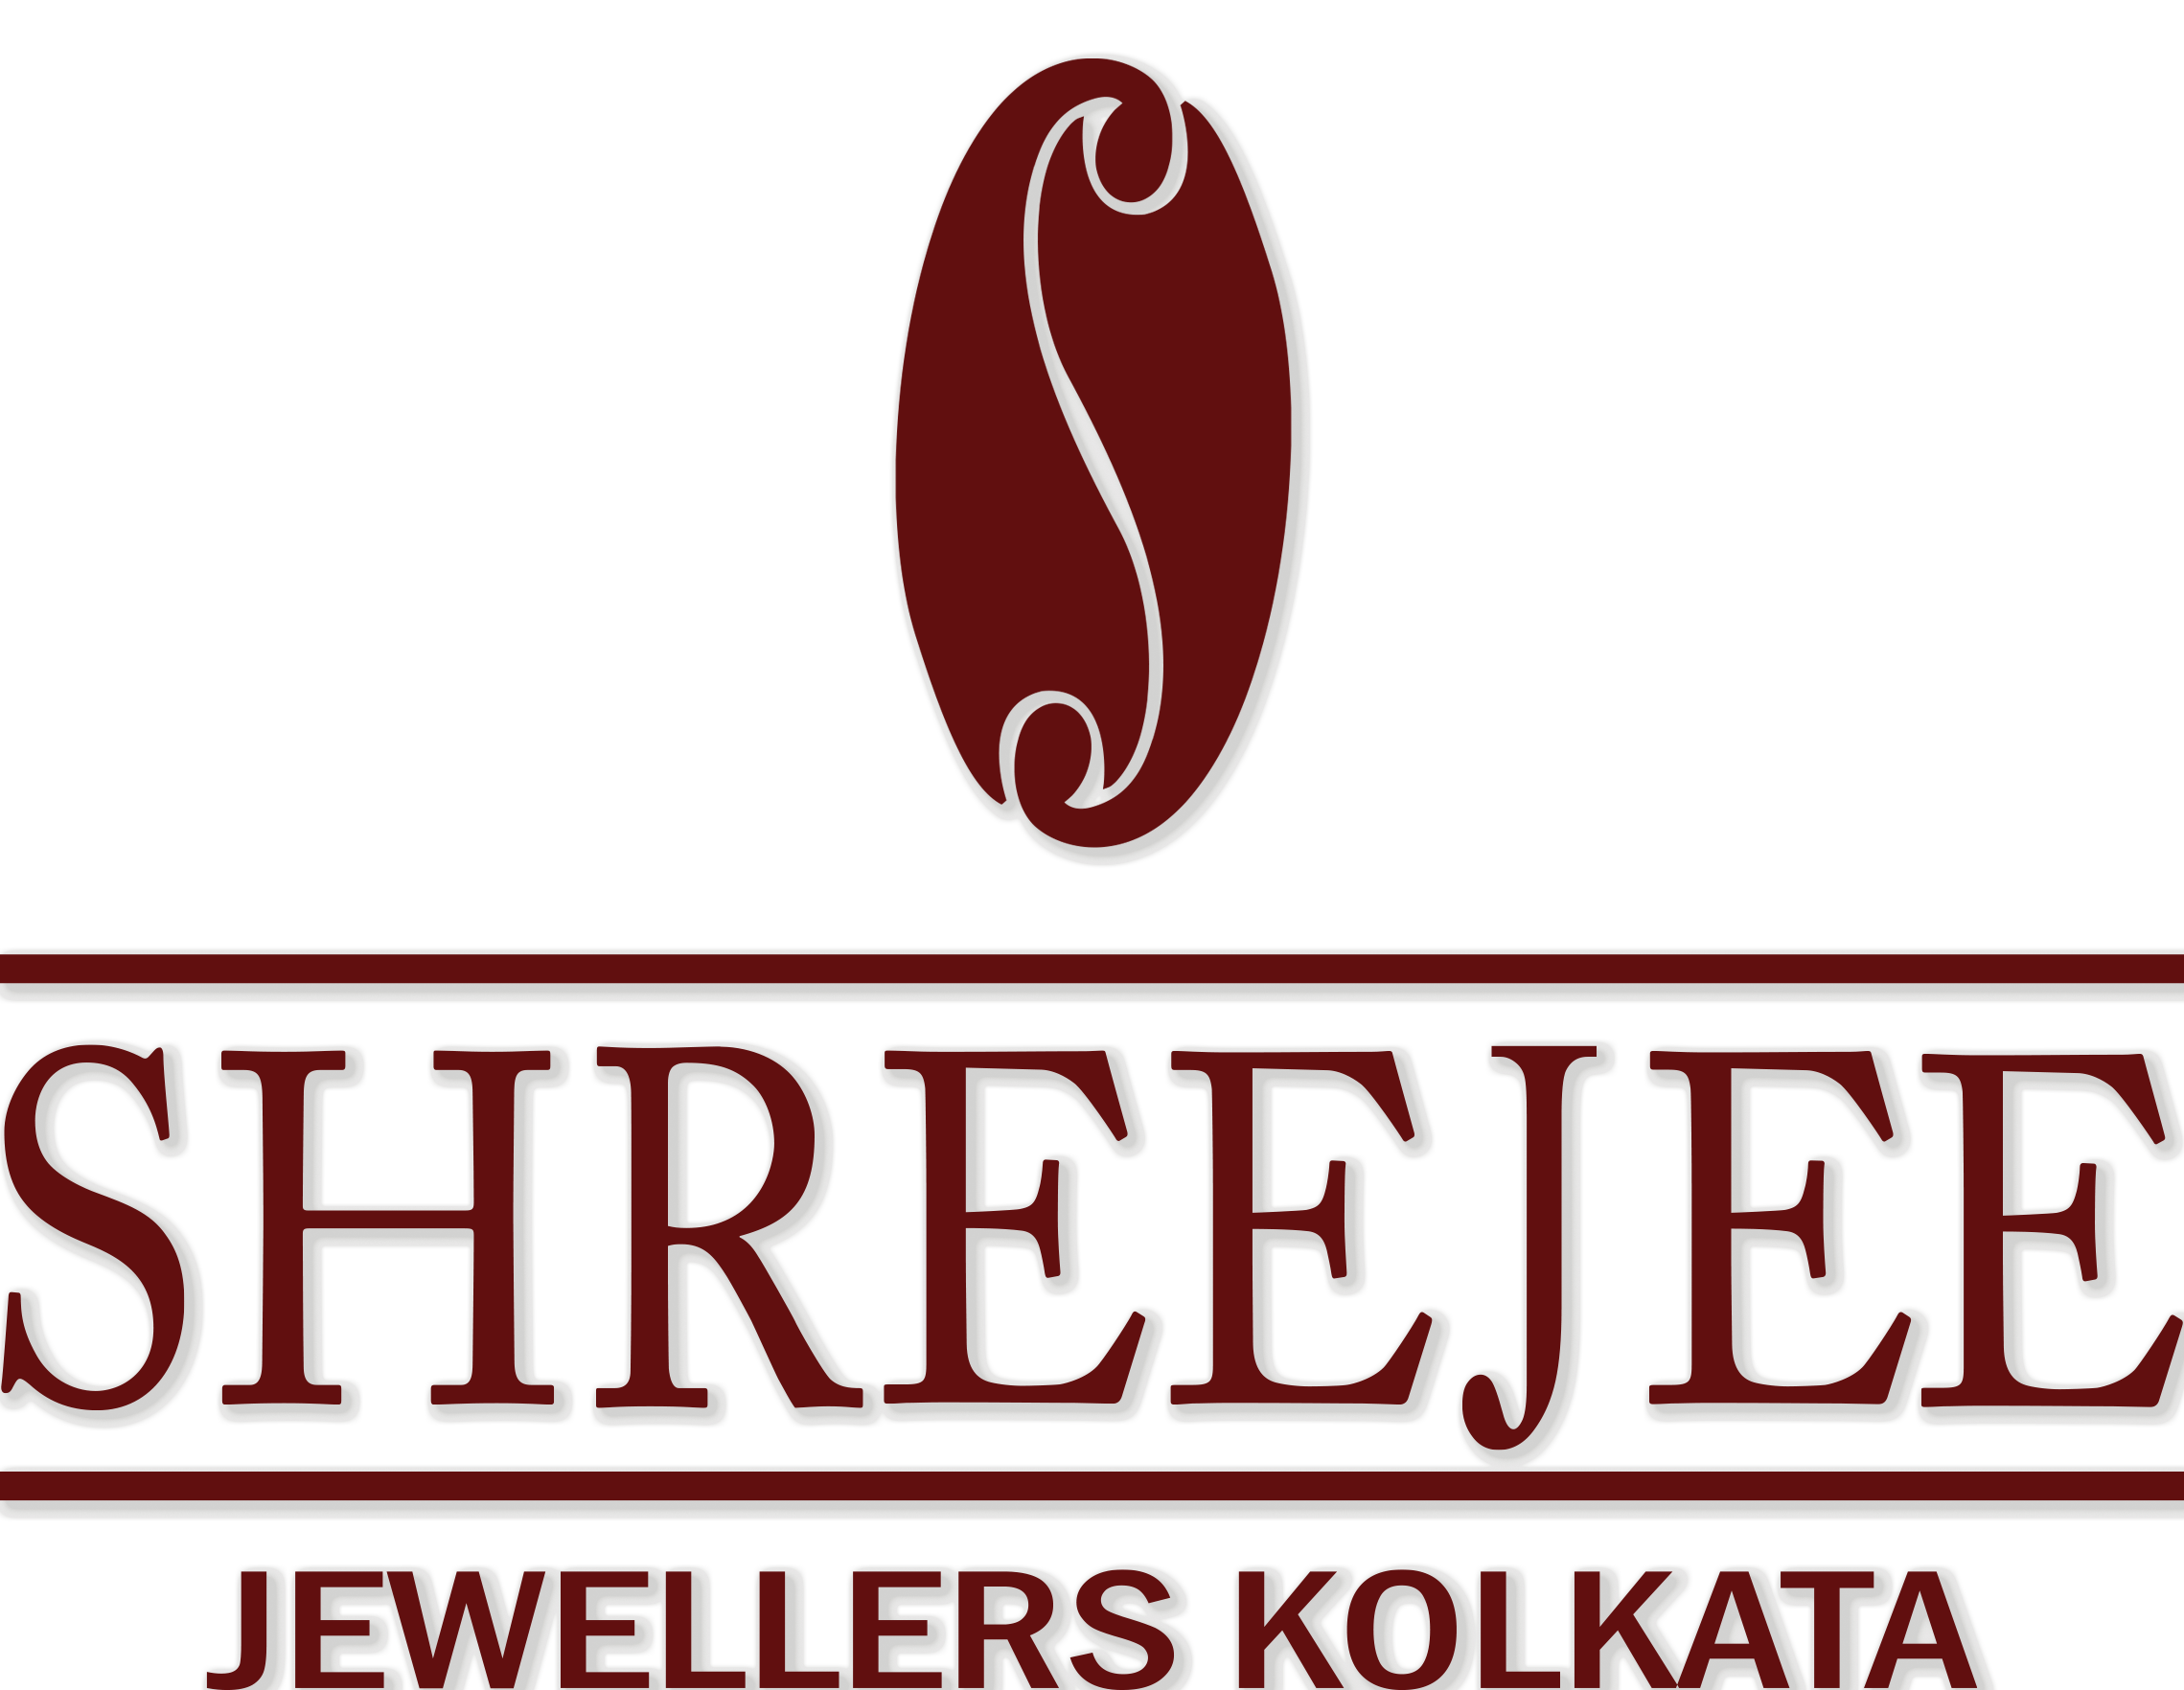 shreejeejewellers.com